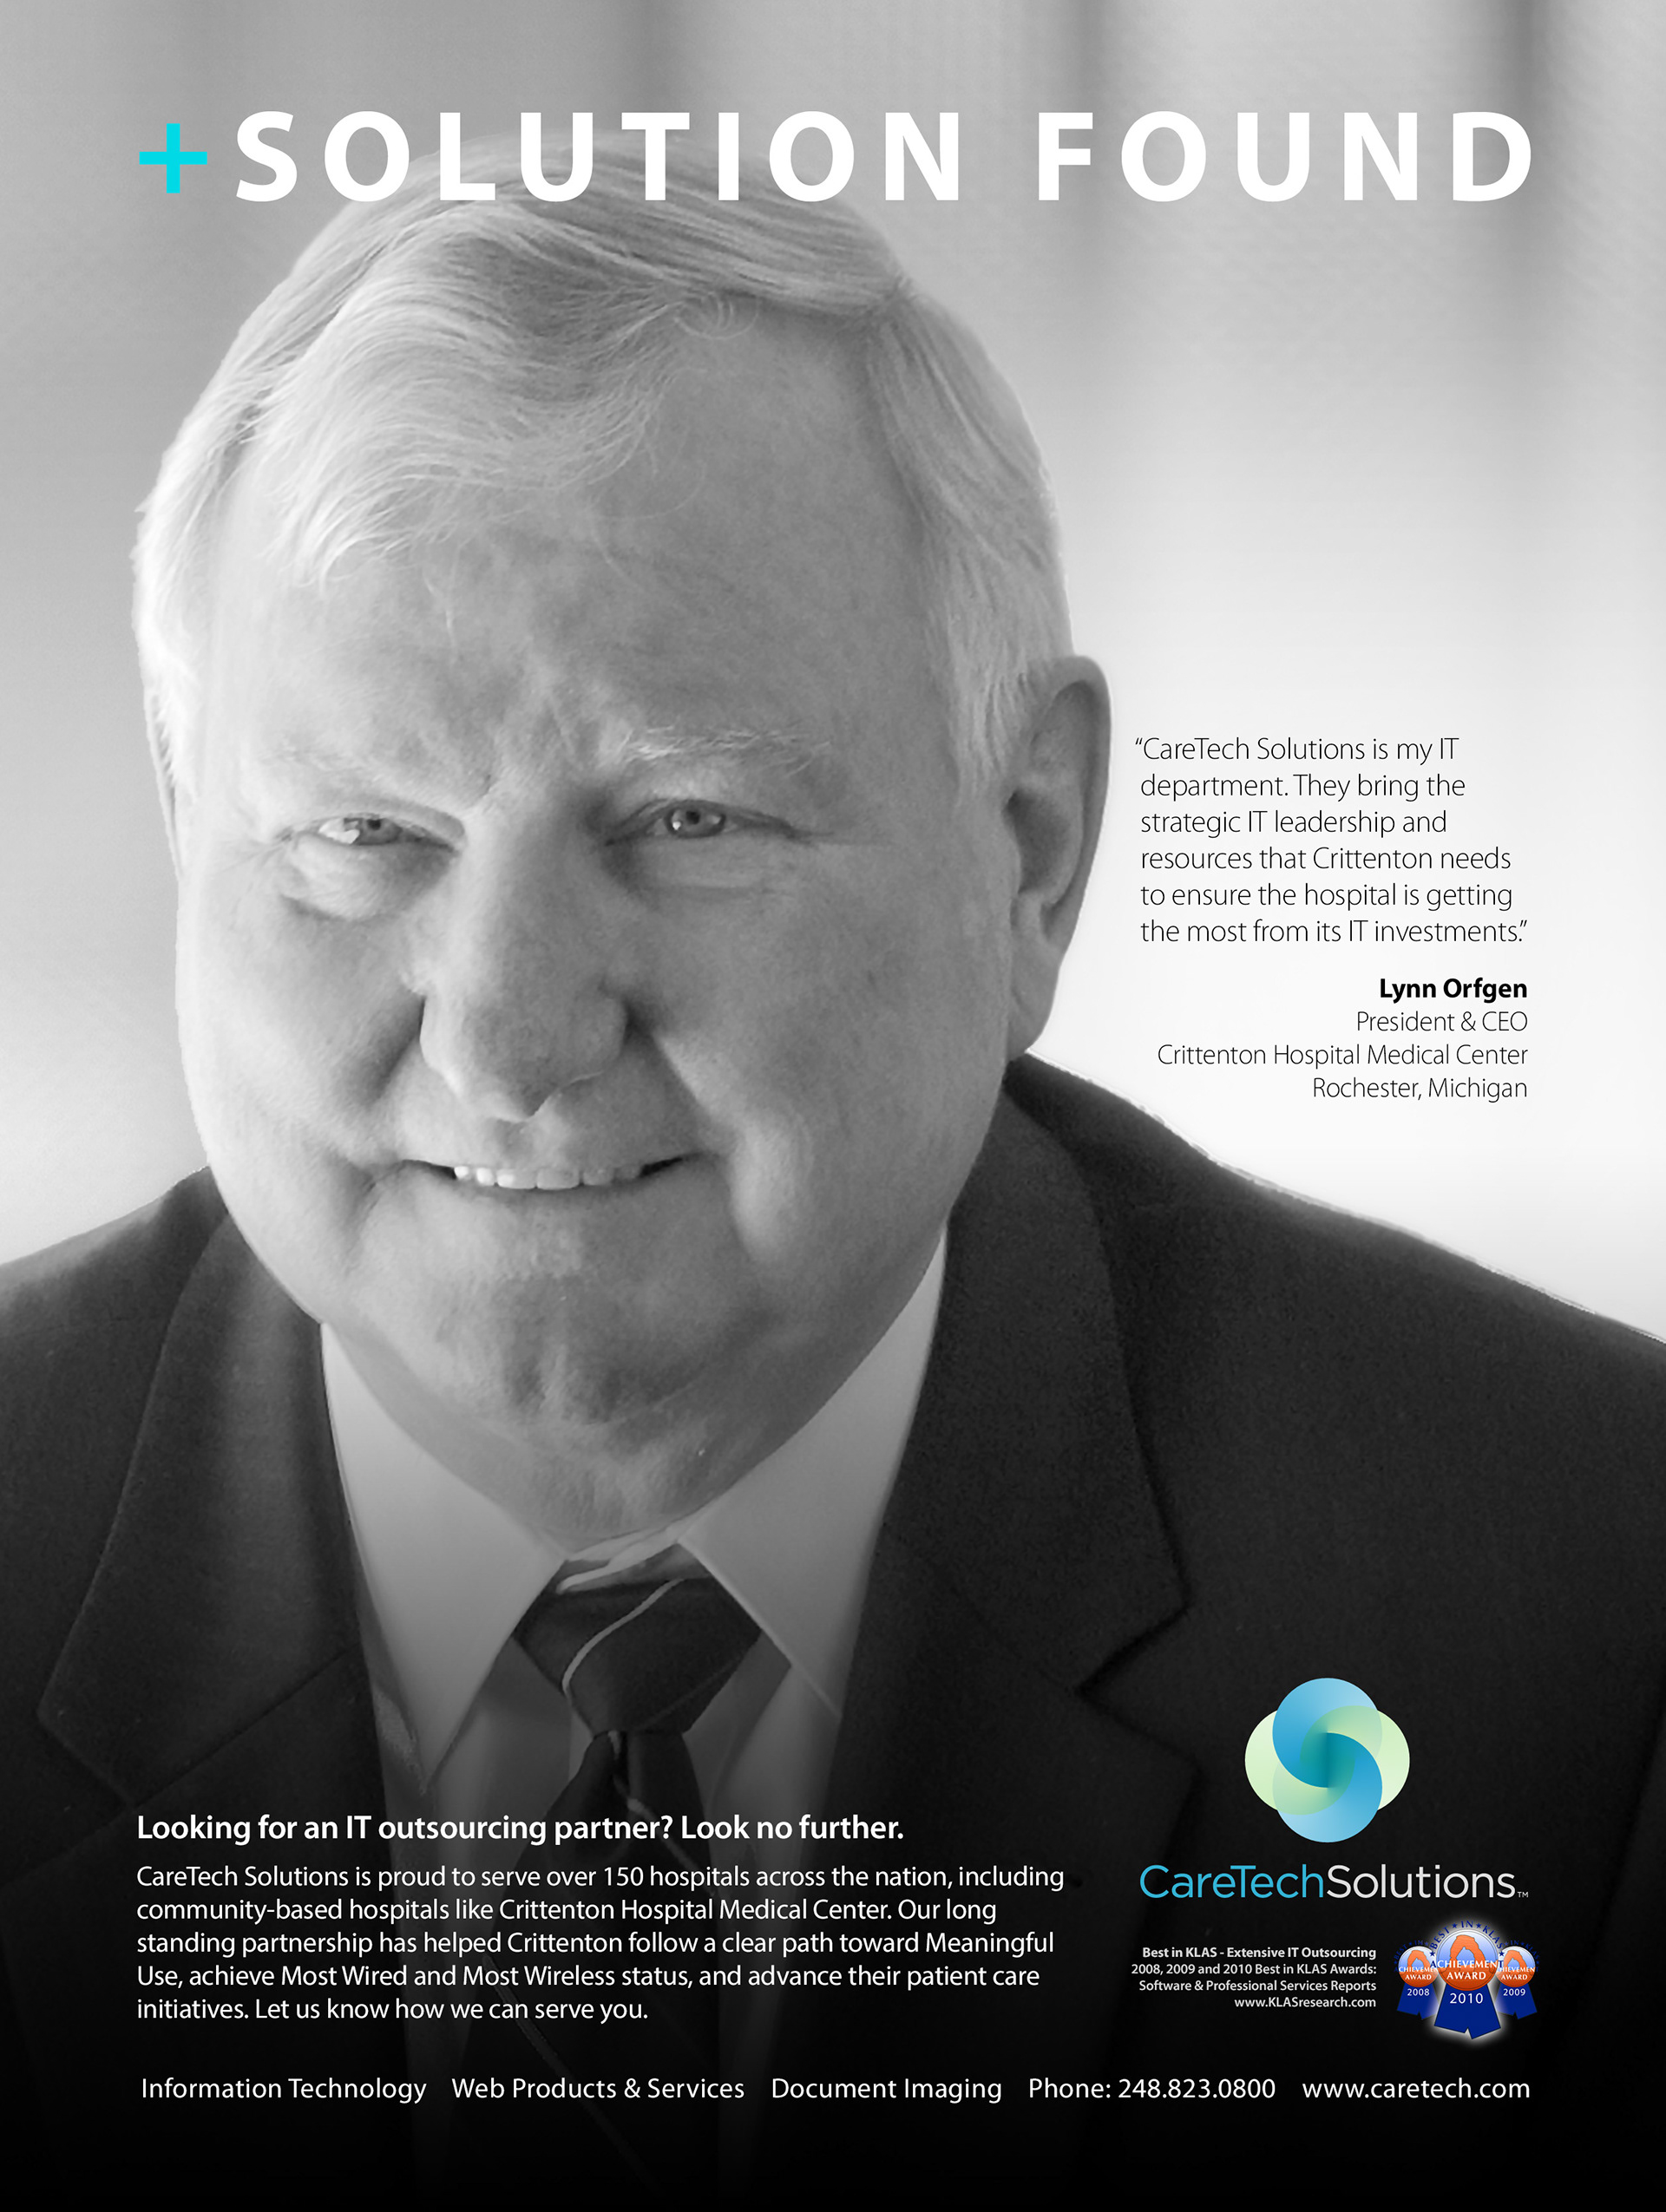 Richard Gutierrez - CareTech Solutions - Solution Found Campaign